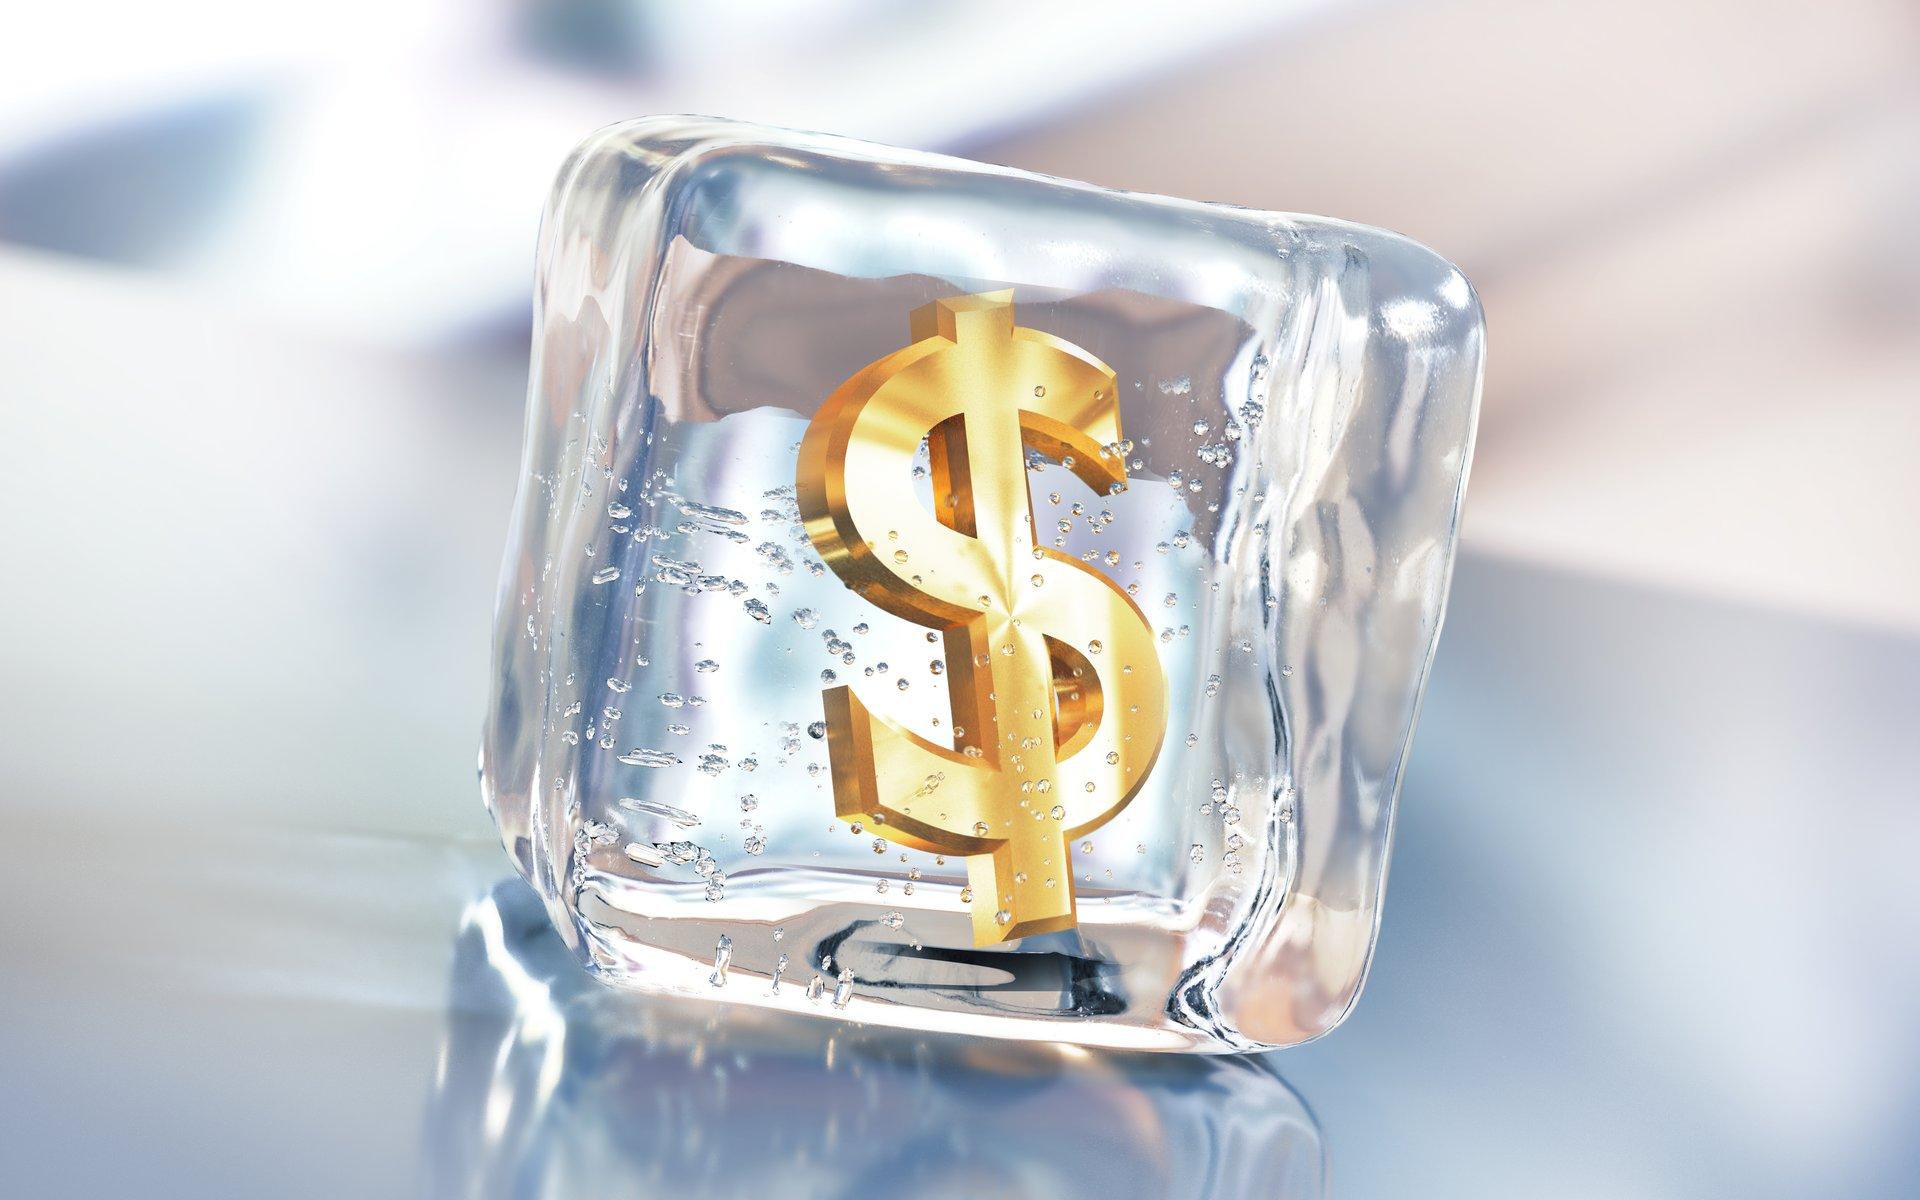 Dollar sign frozen in ice cube.